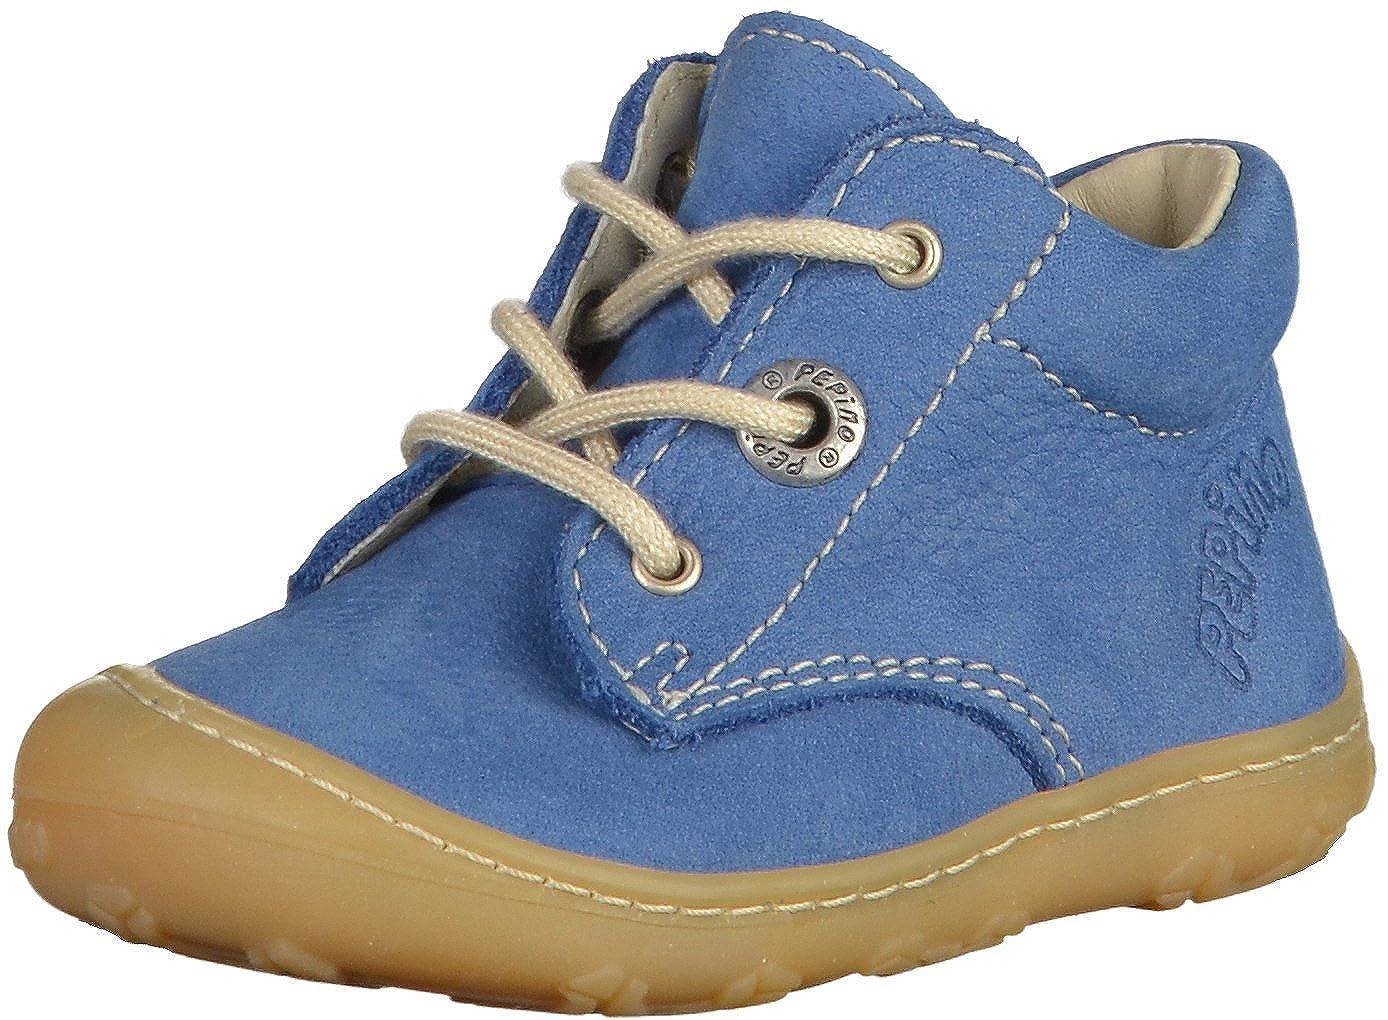 RICOSTA Cory, Baby Girls' Walking Baby Shoes Baby Girls' Walking Baby Shoes 65 1223600